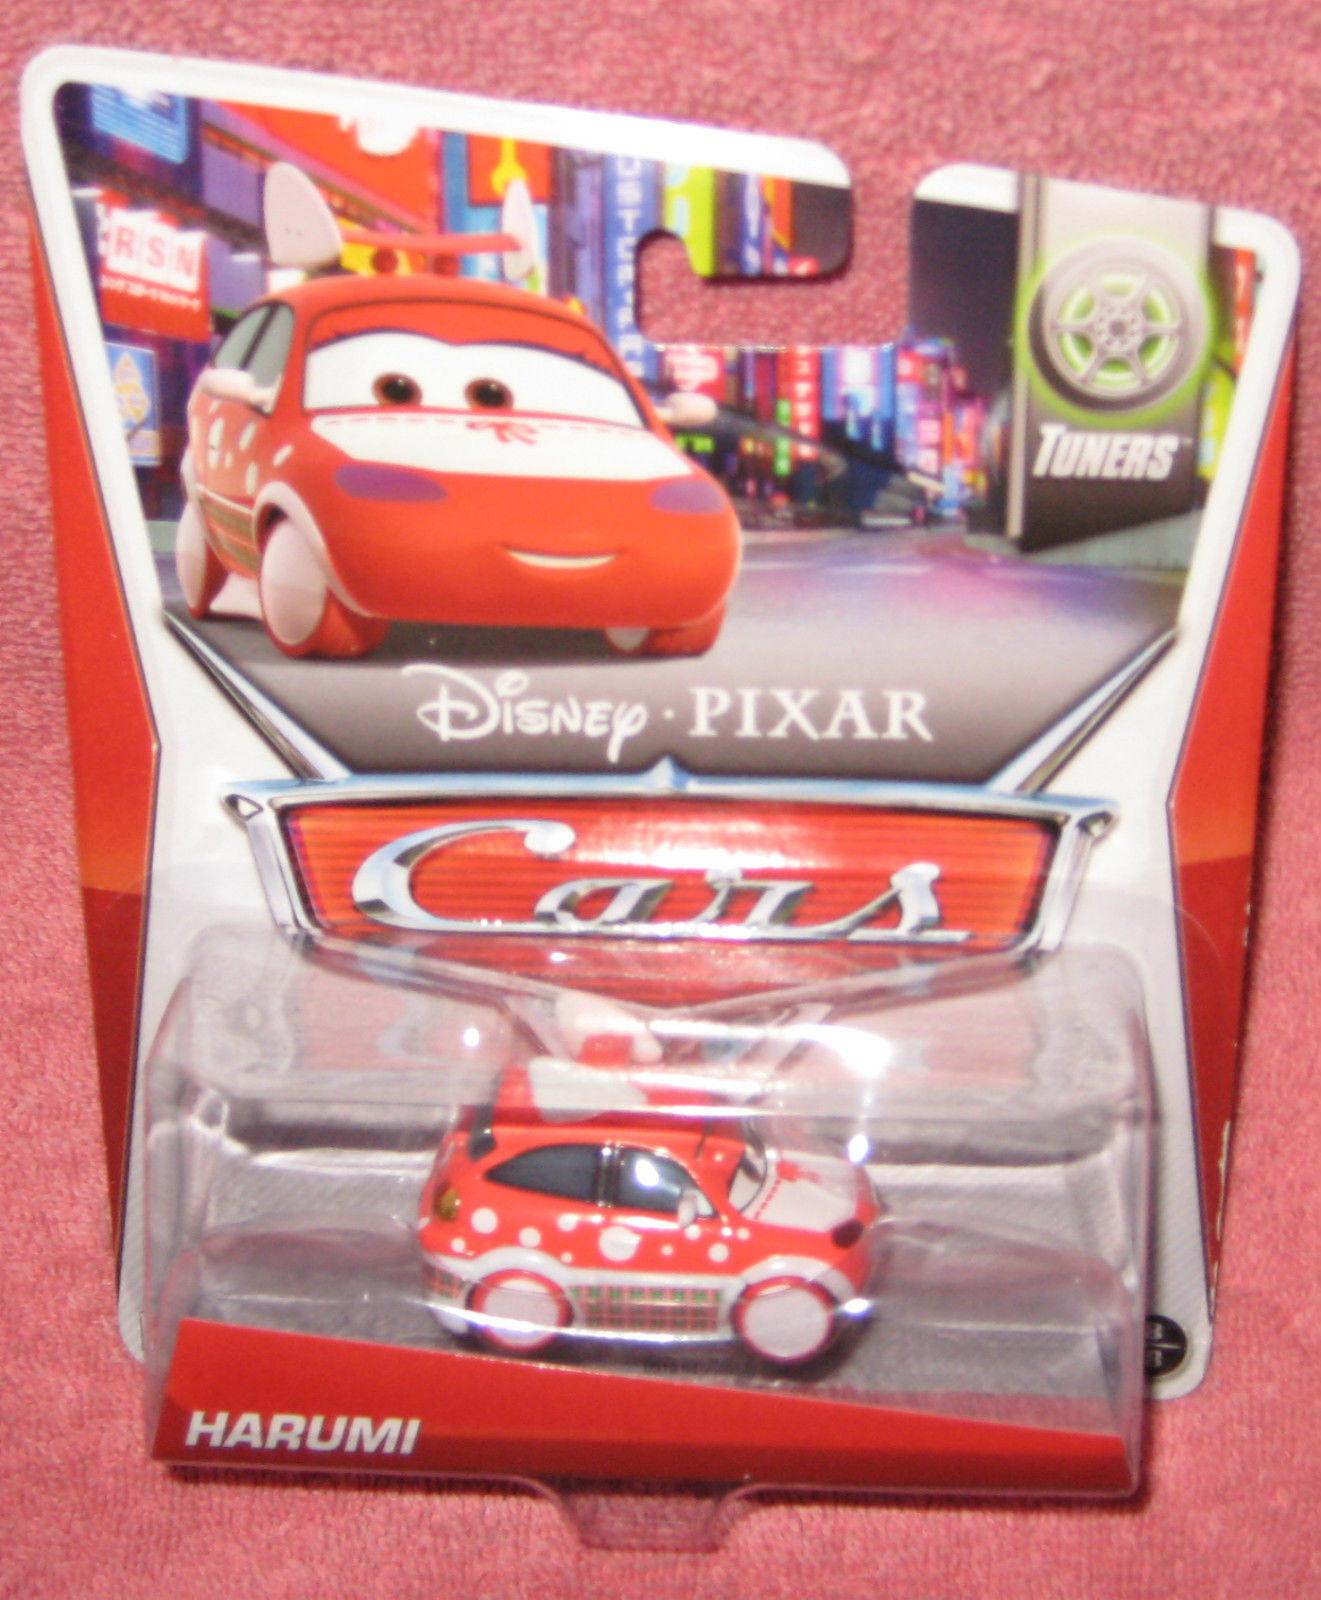 Disney Pixar Cars 2 Harumi. 2014 Release Tuners # 8 of 8.